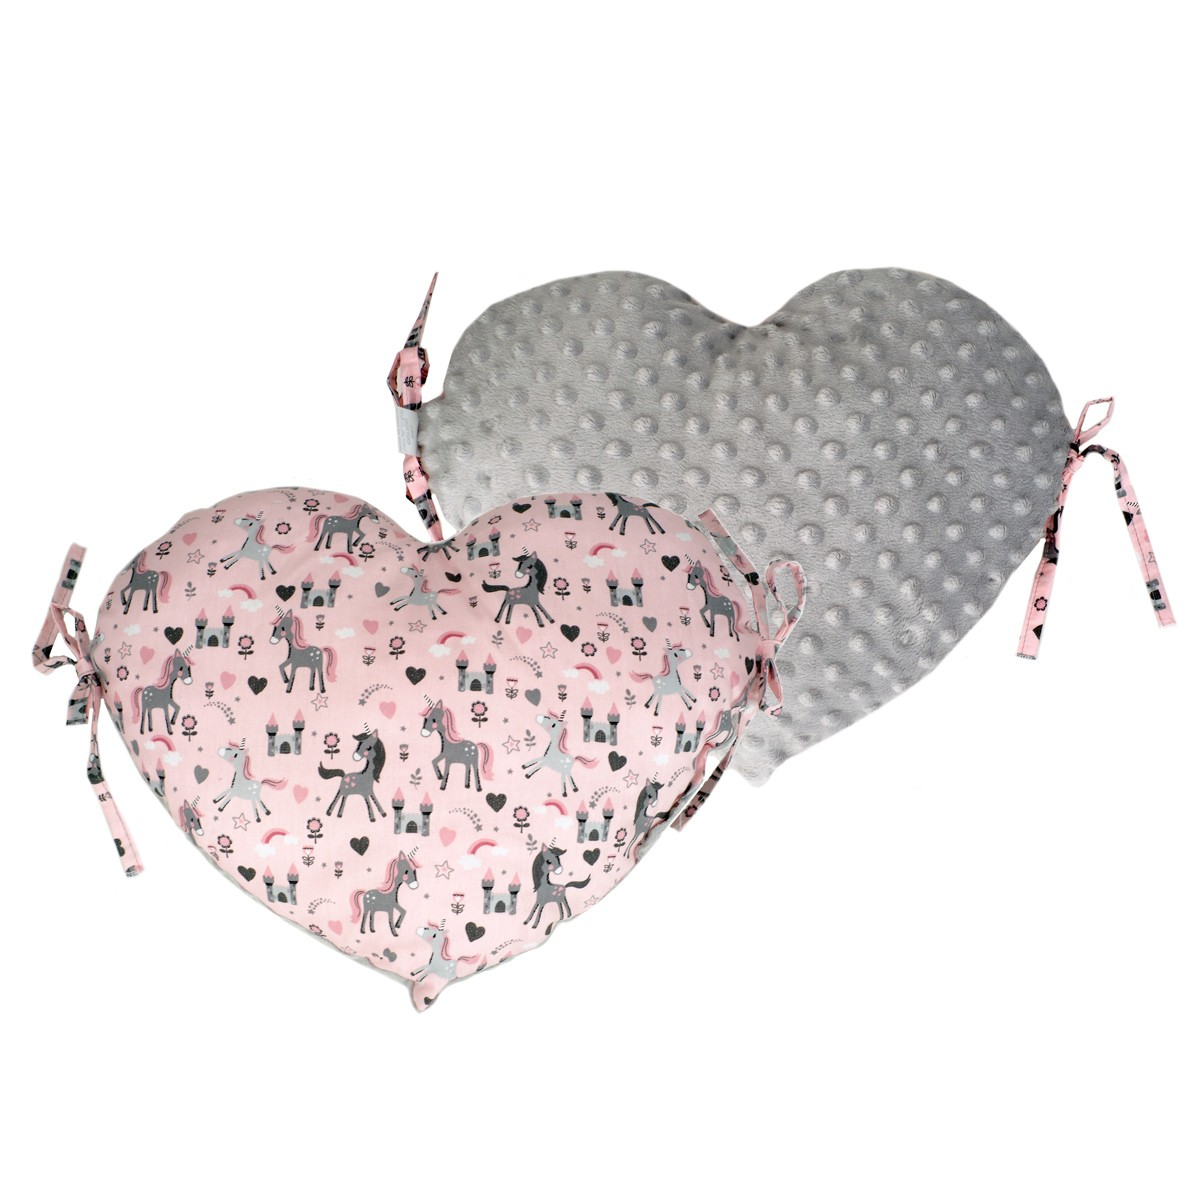 1132d826abd Προστατευτικό Μαξιλάρι Κούνιας Ninna Nanna Unicorn Heart 95168